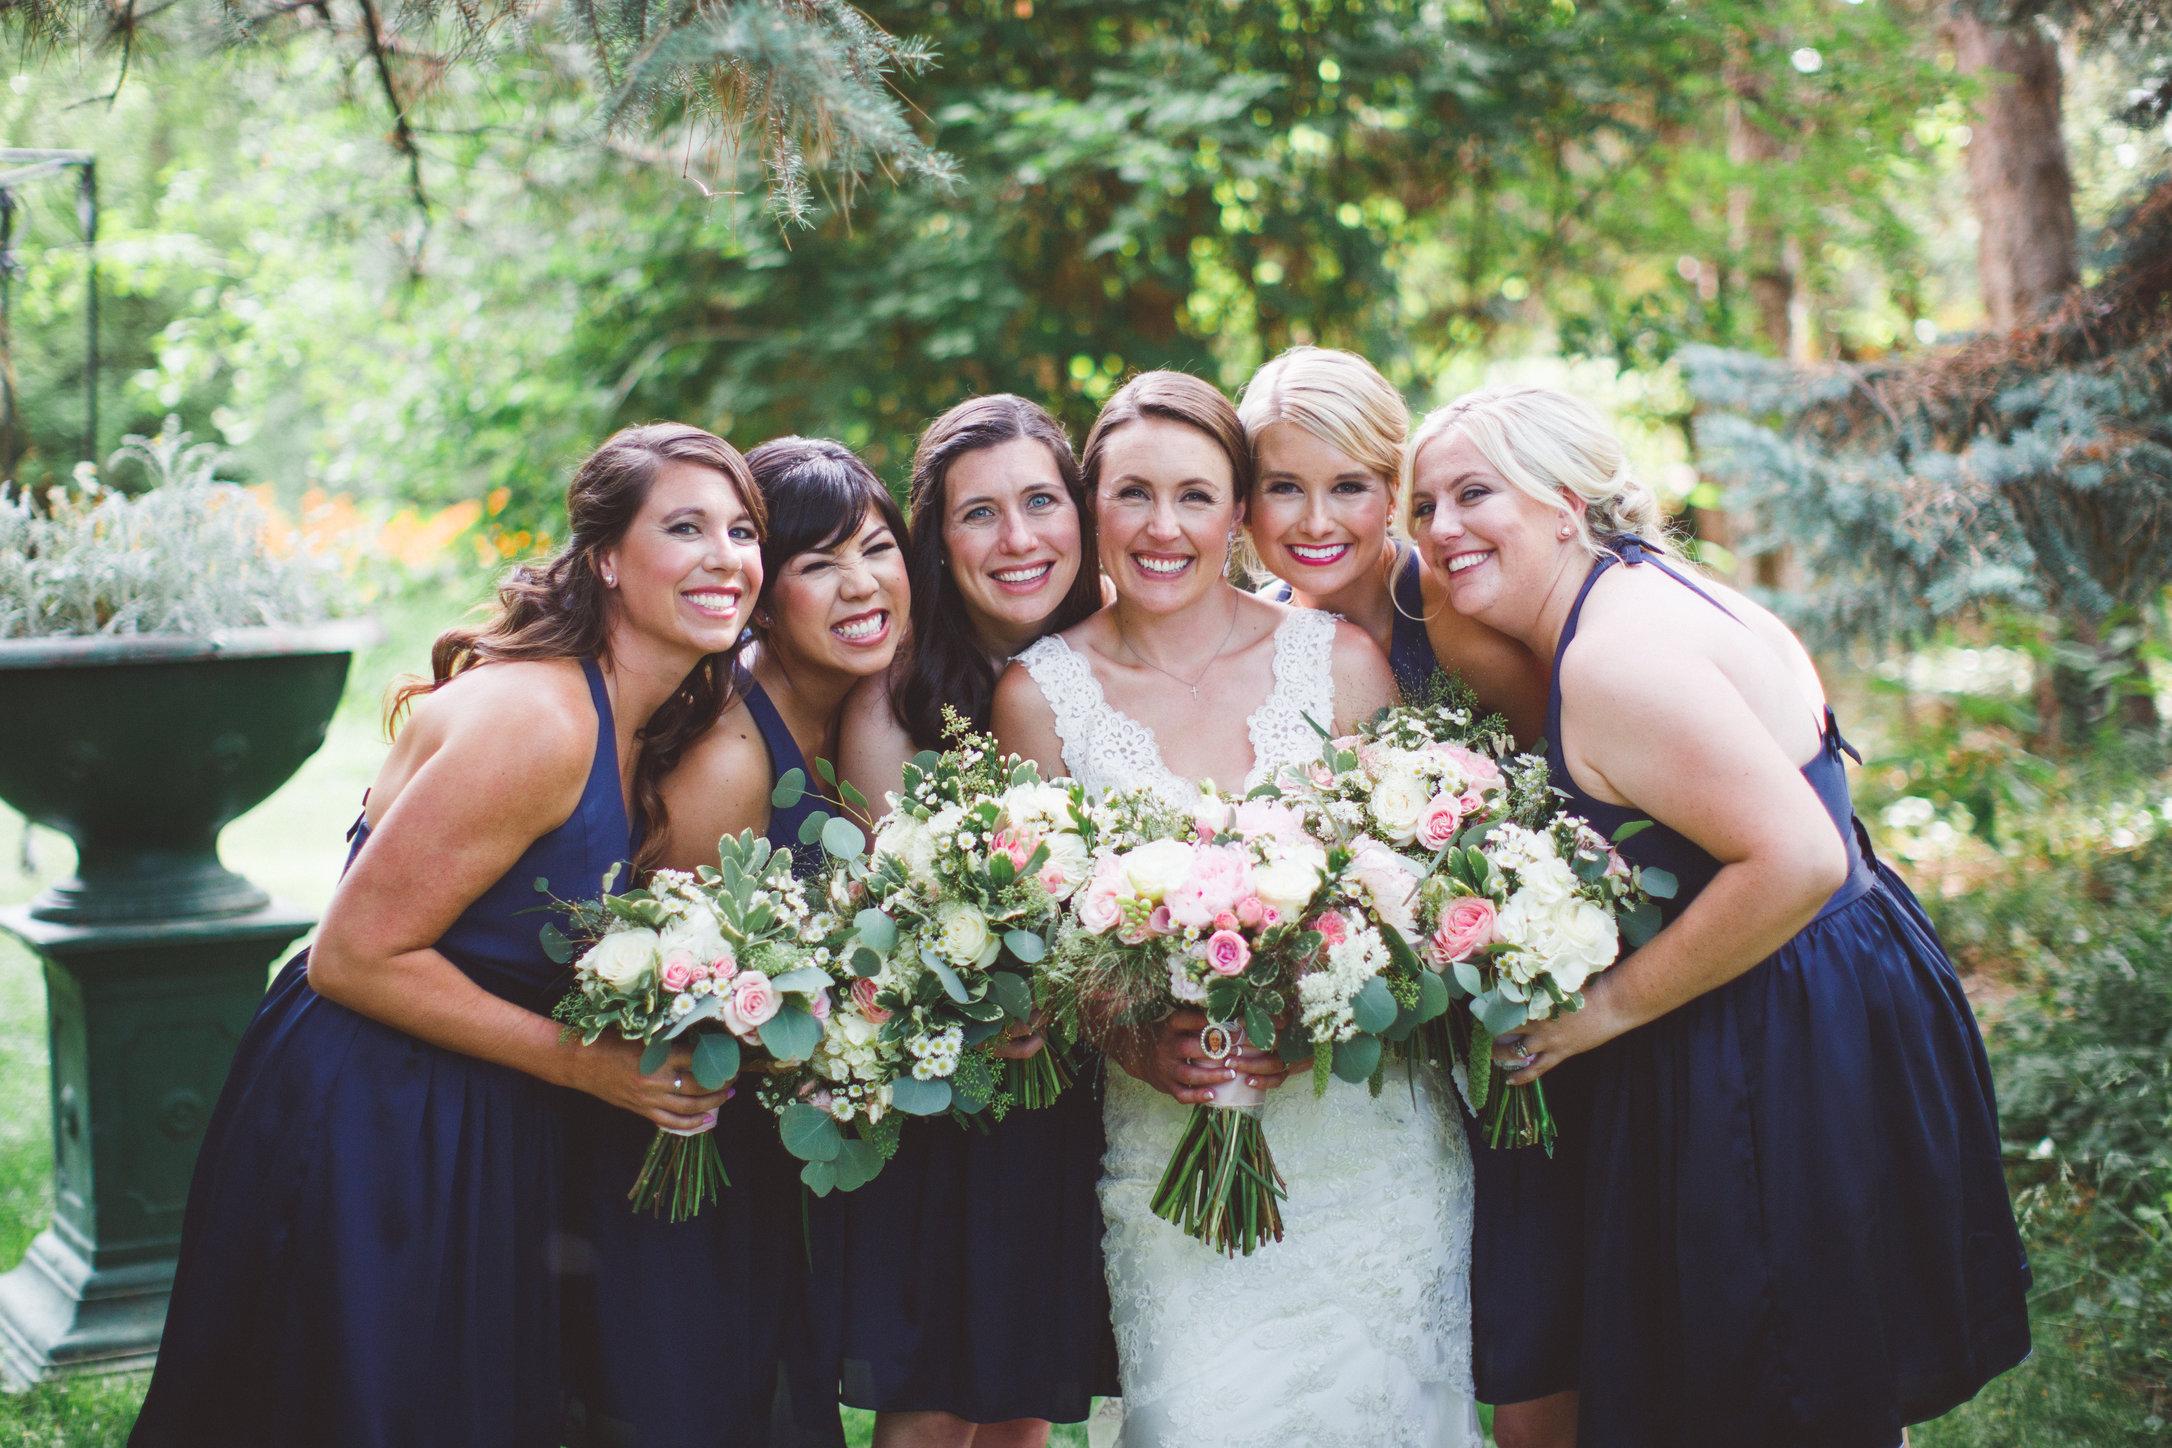 SandC-wedding-374.jpg